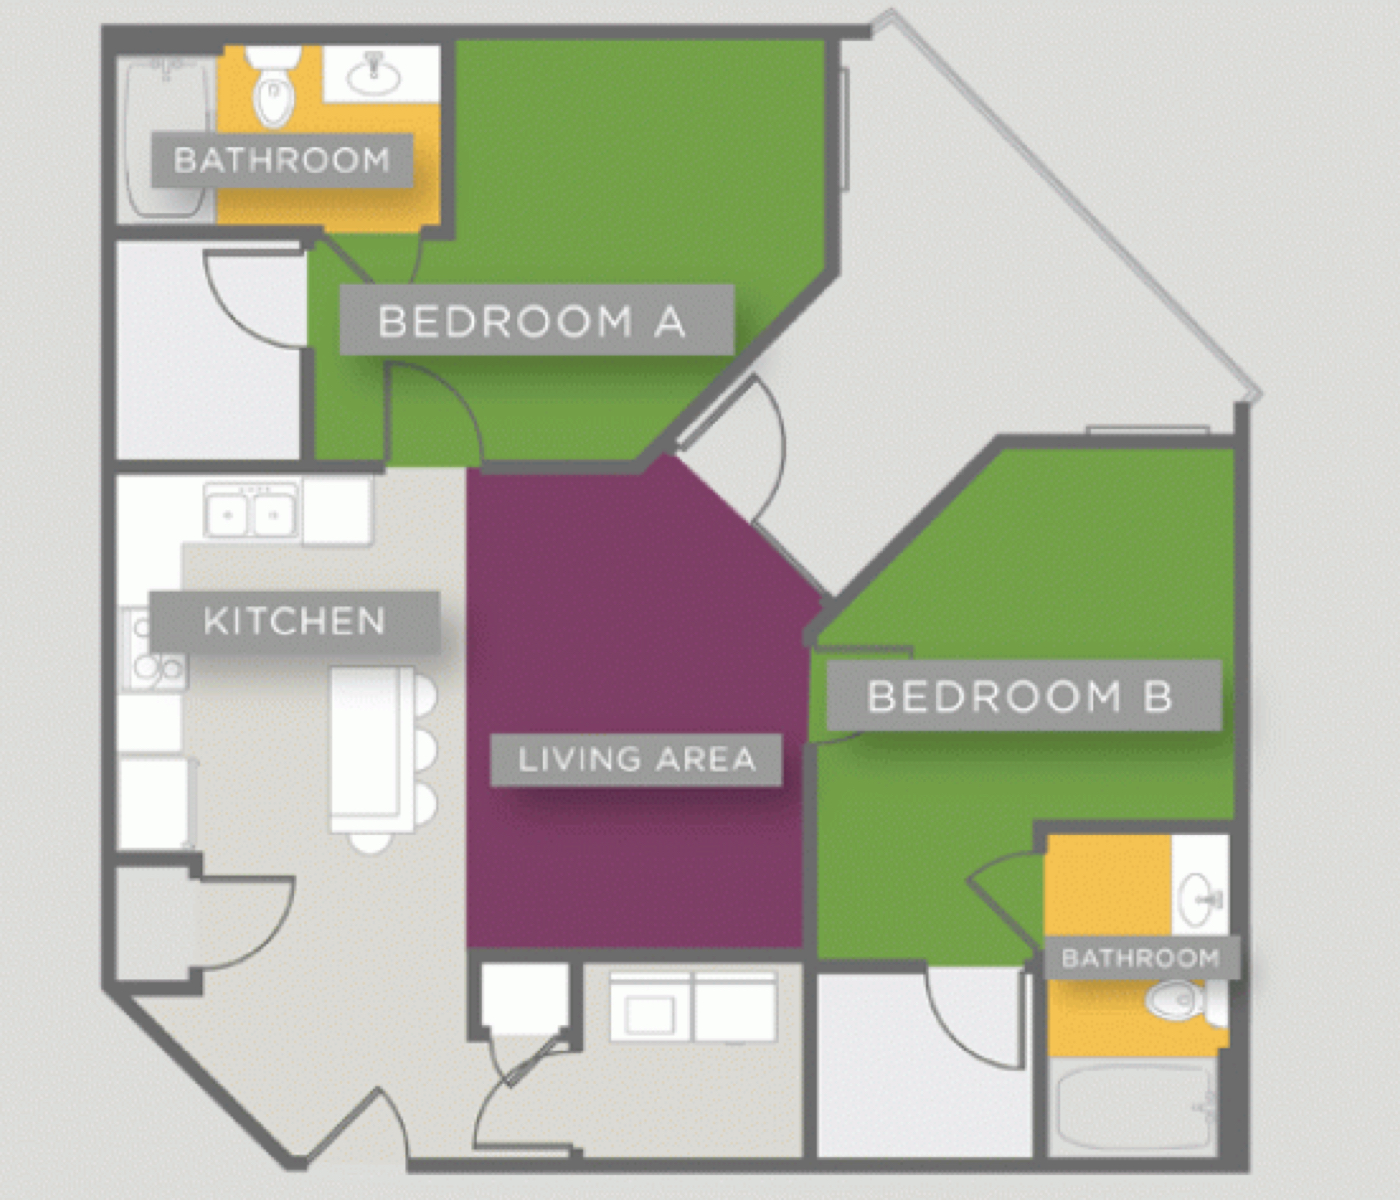 Loft-Vue-student-housing-Worthington